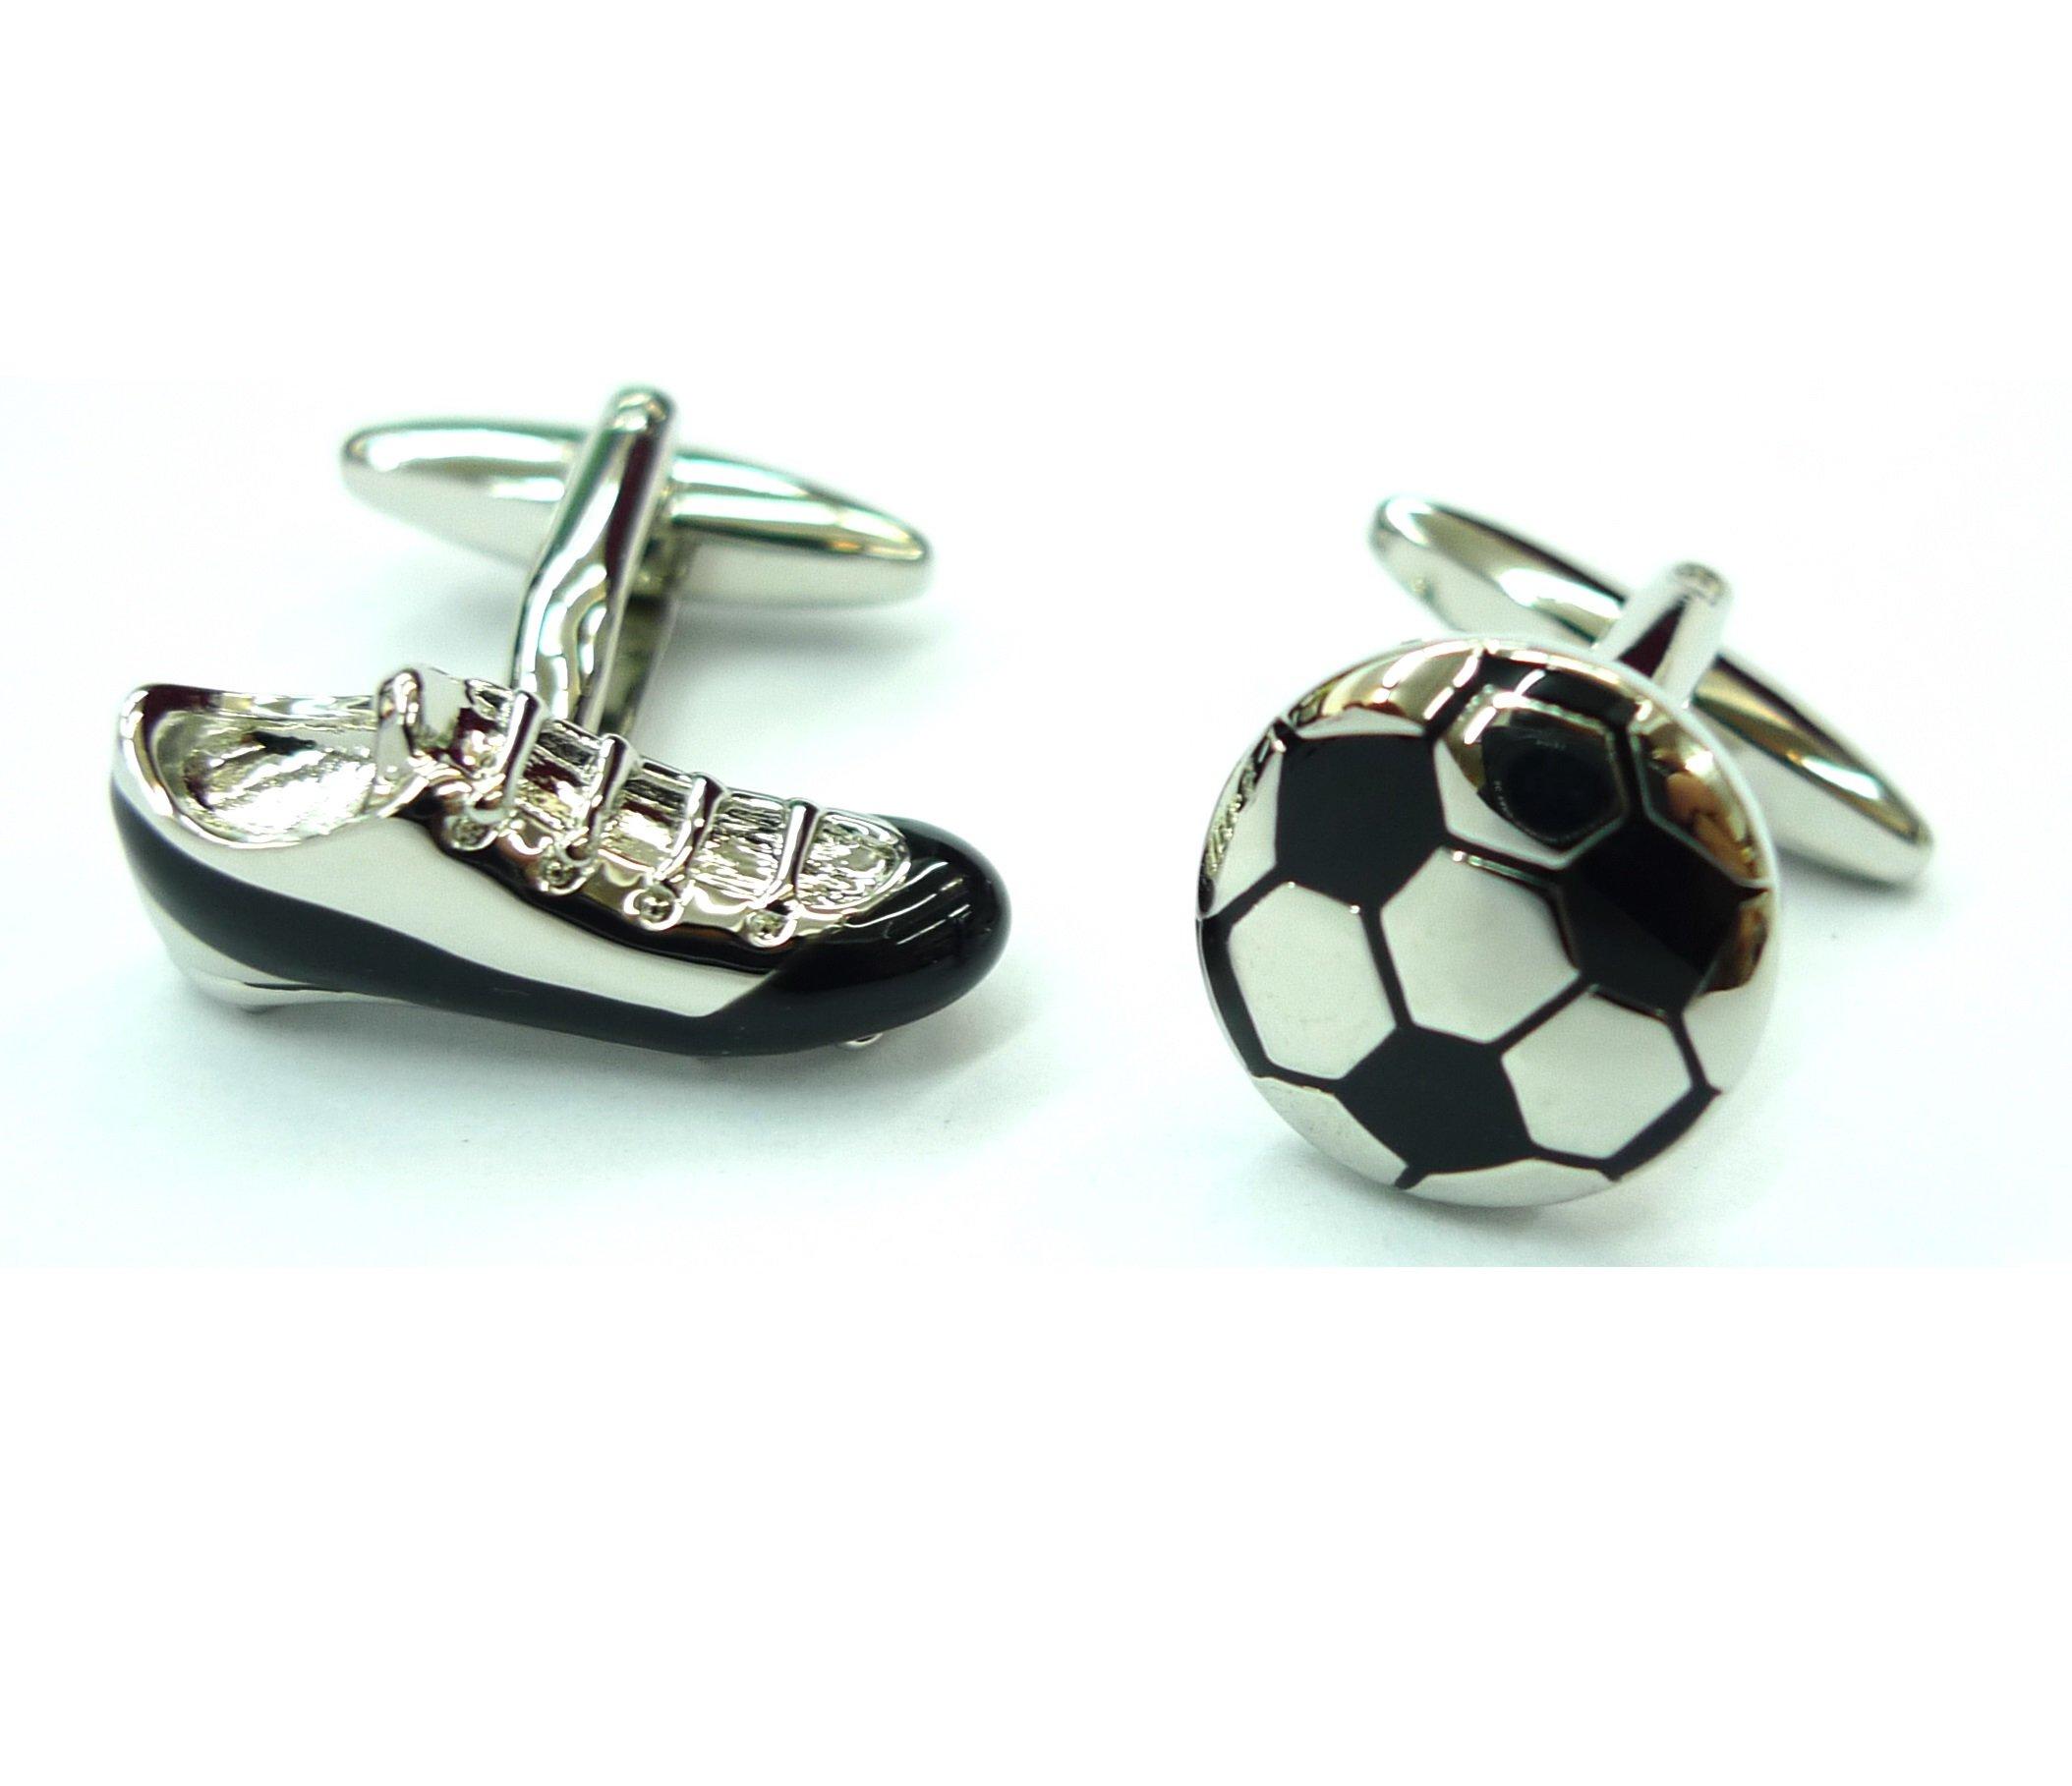 Tailor B Soccer Cufflinks Ball and Boot British Football World Cup Cuff Links